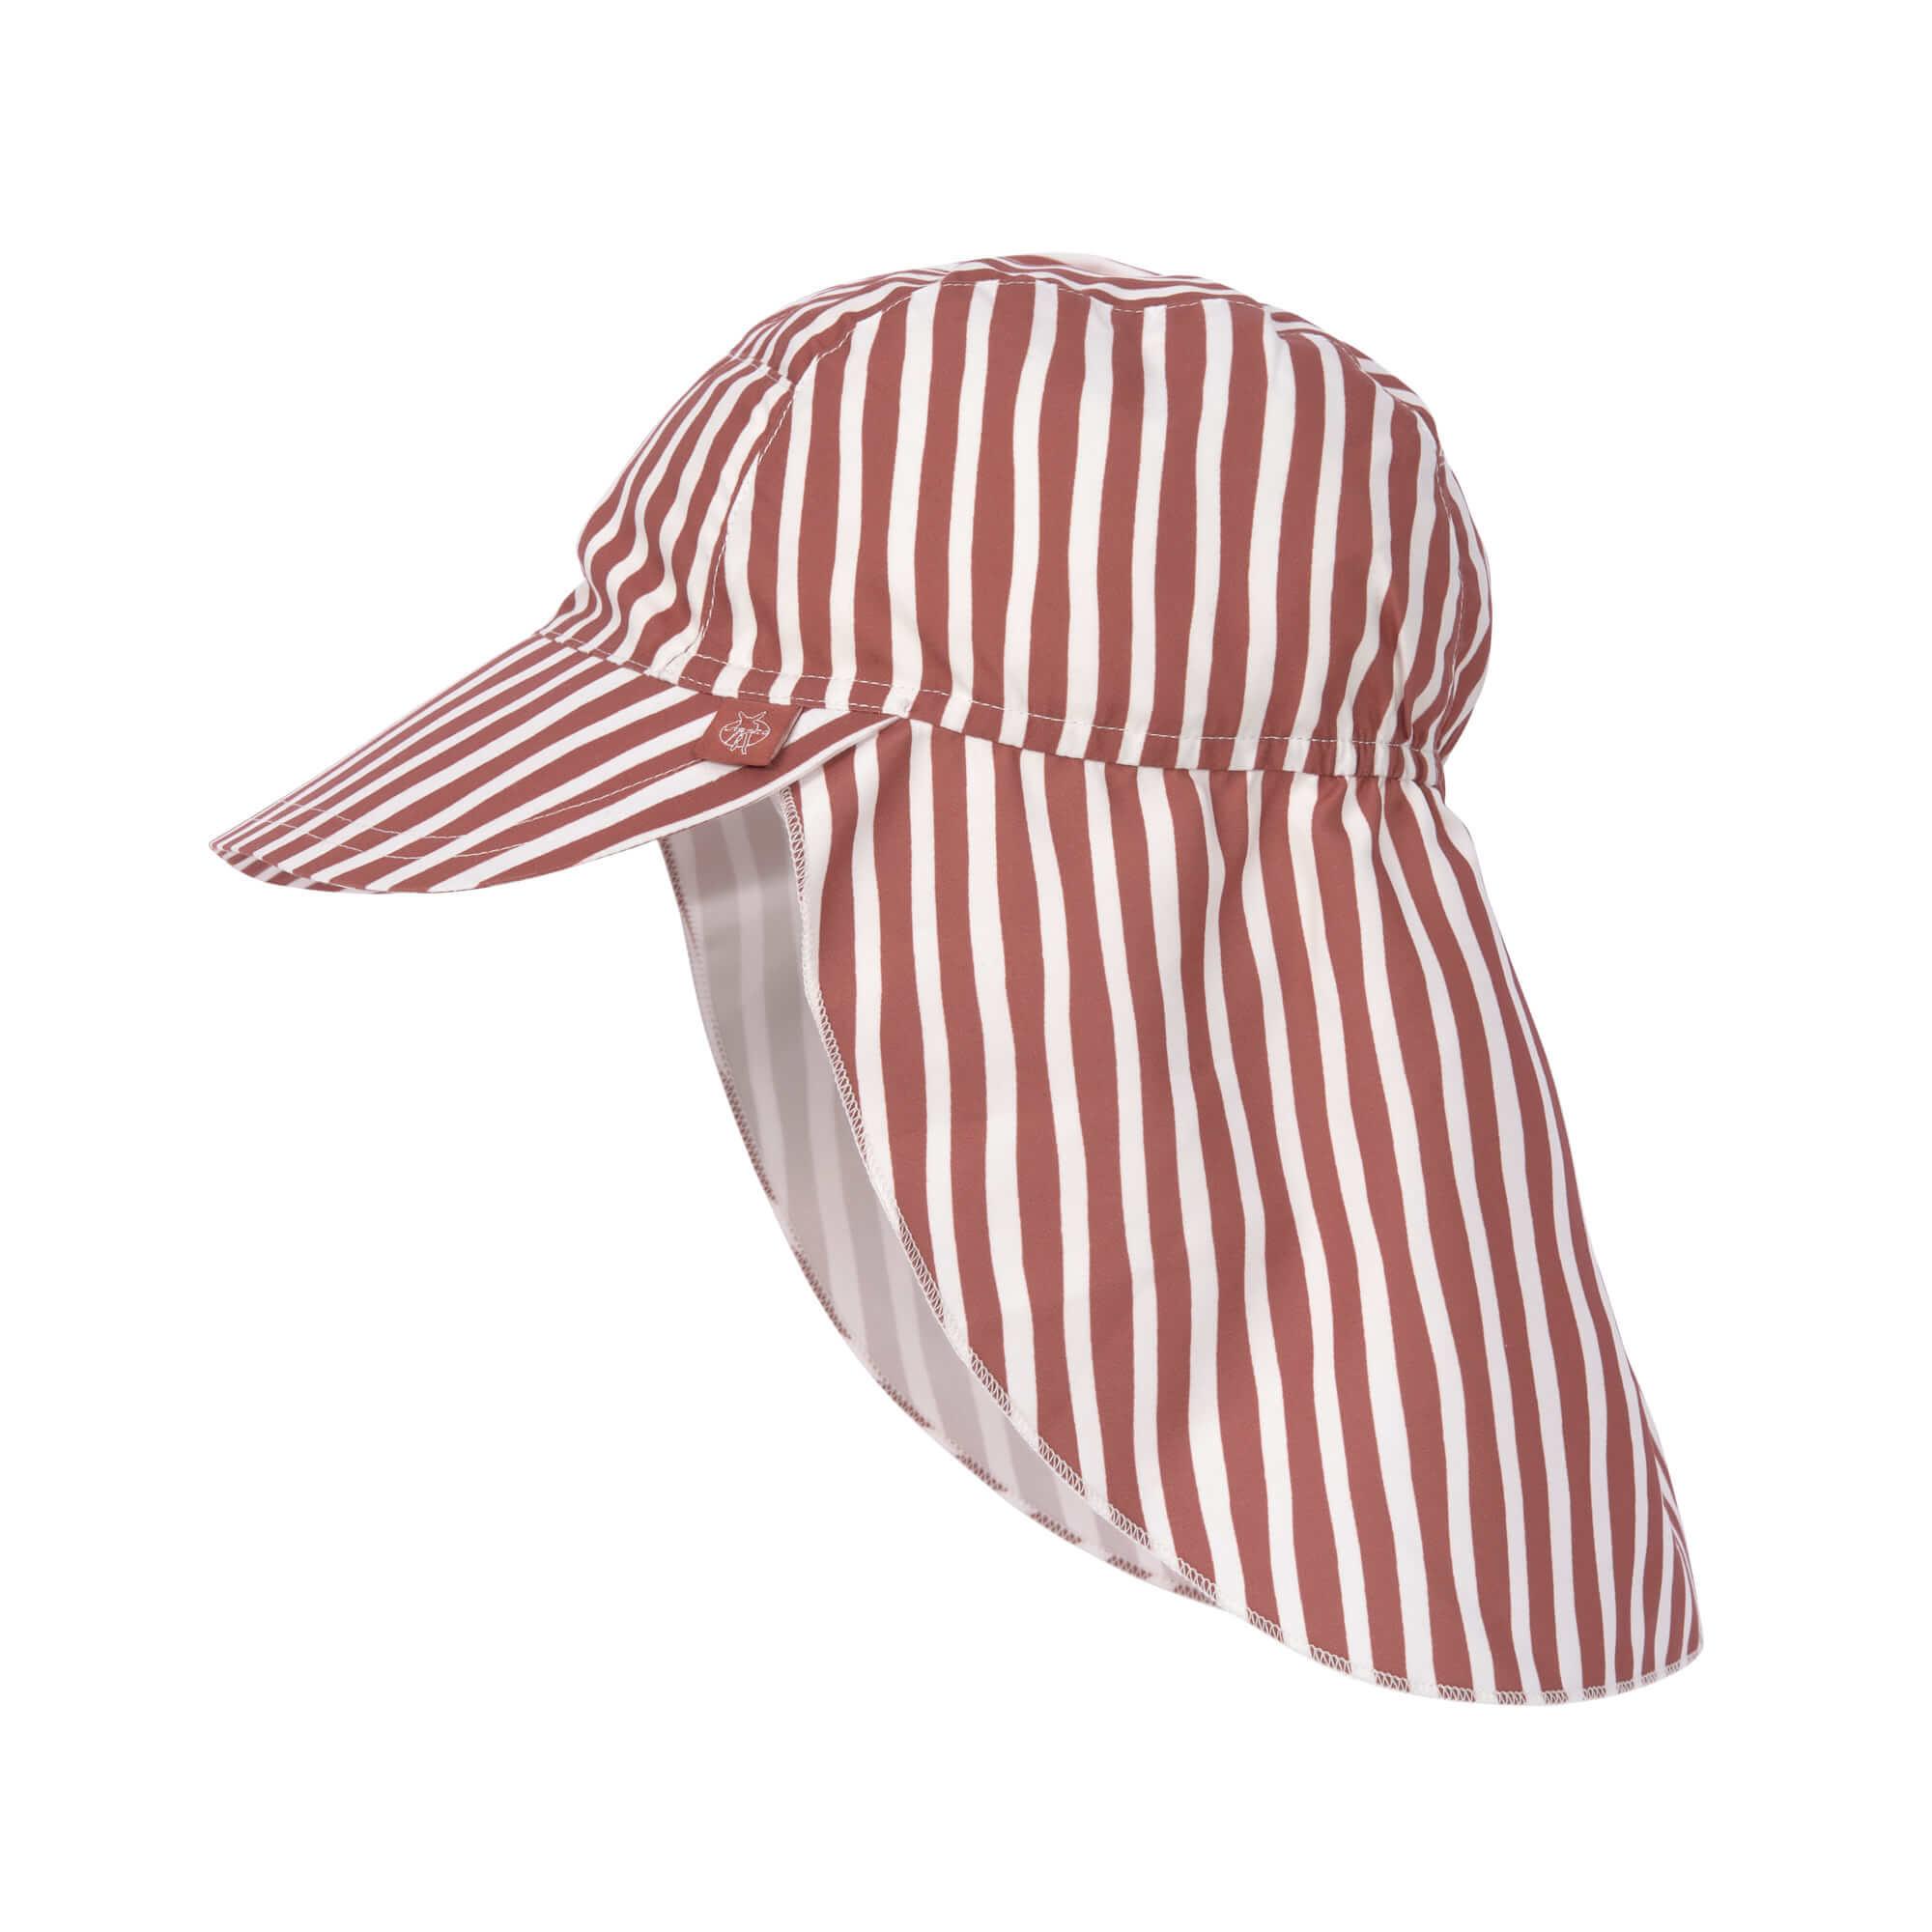 Lässig Splash & Fun Sun Protection Zonnehoed Flaphoed met UV bescherming - Stripes red 19-36 maanden